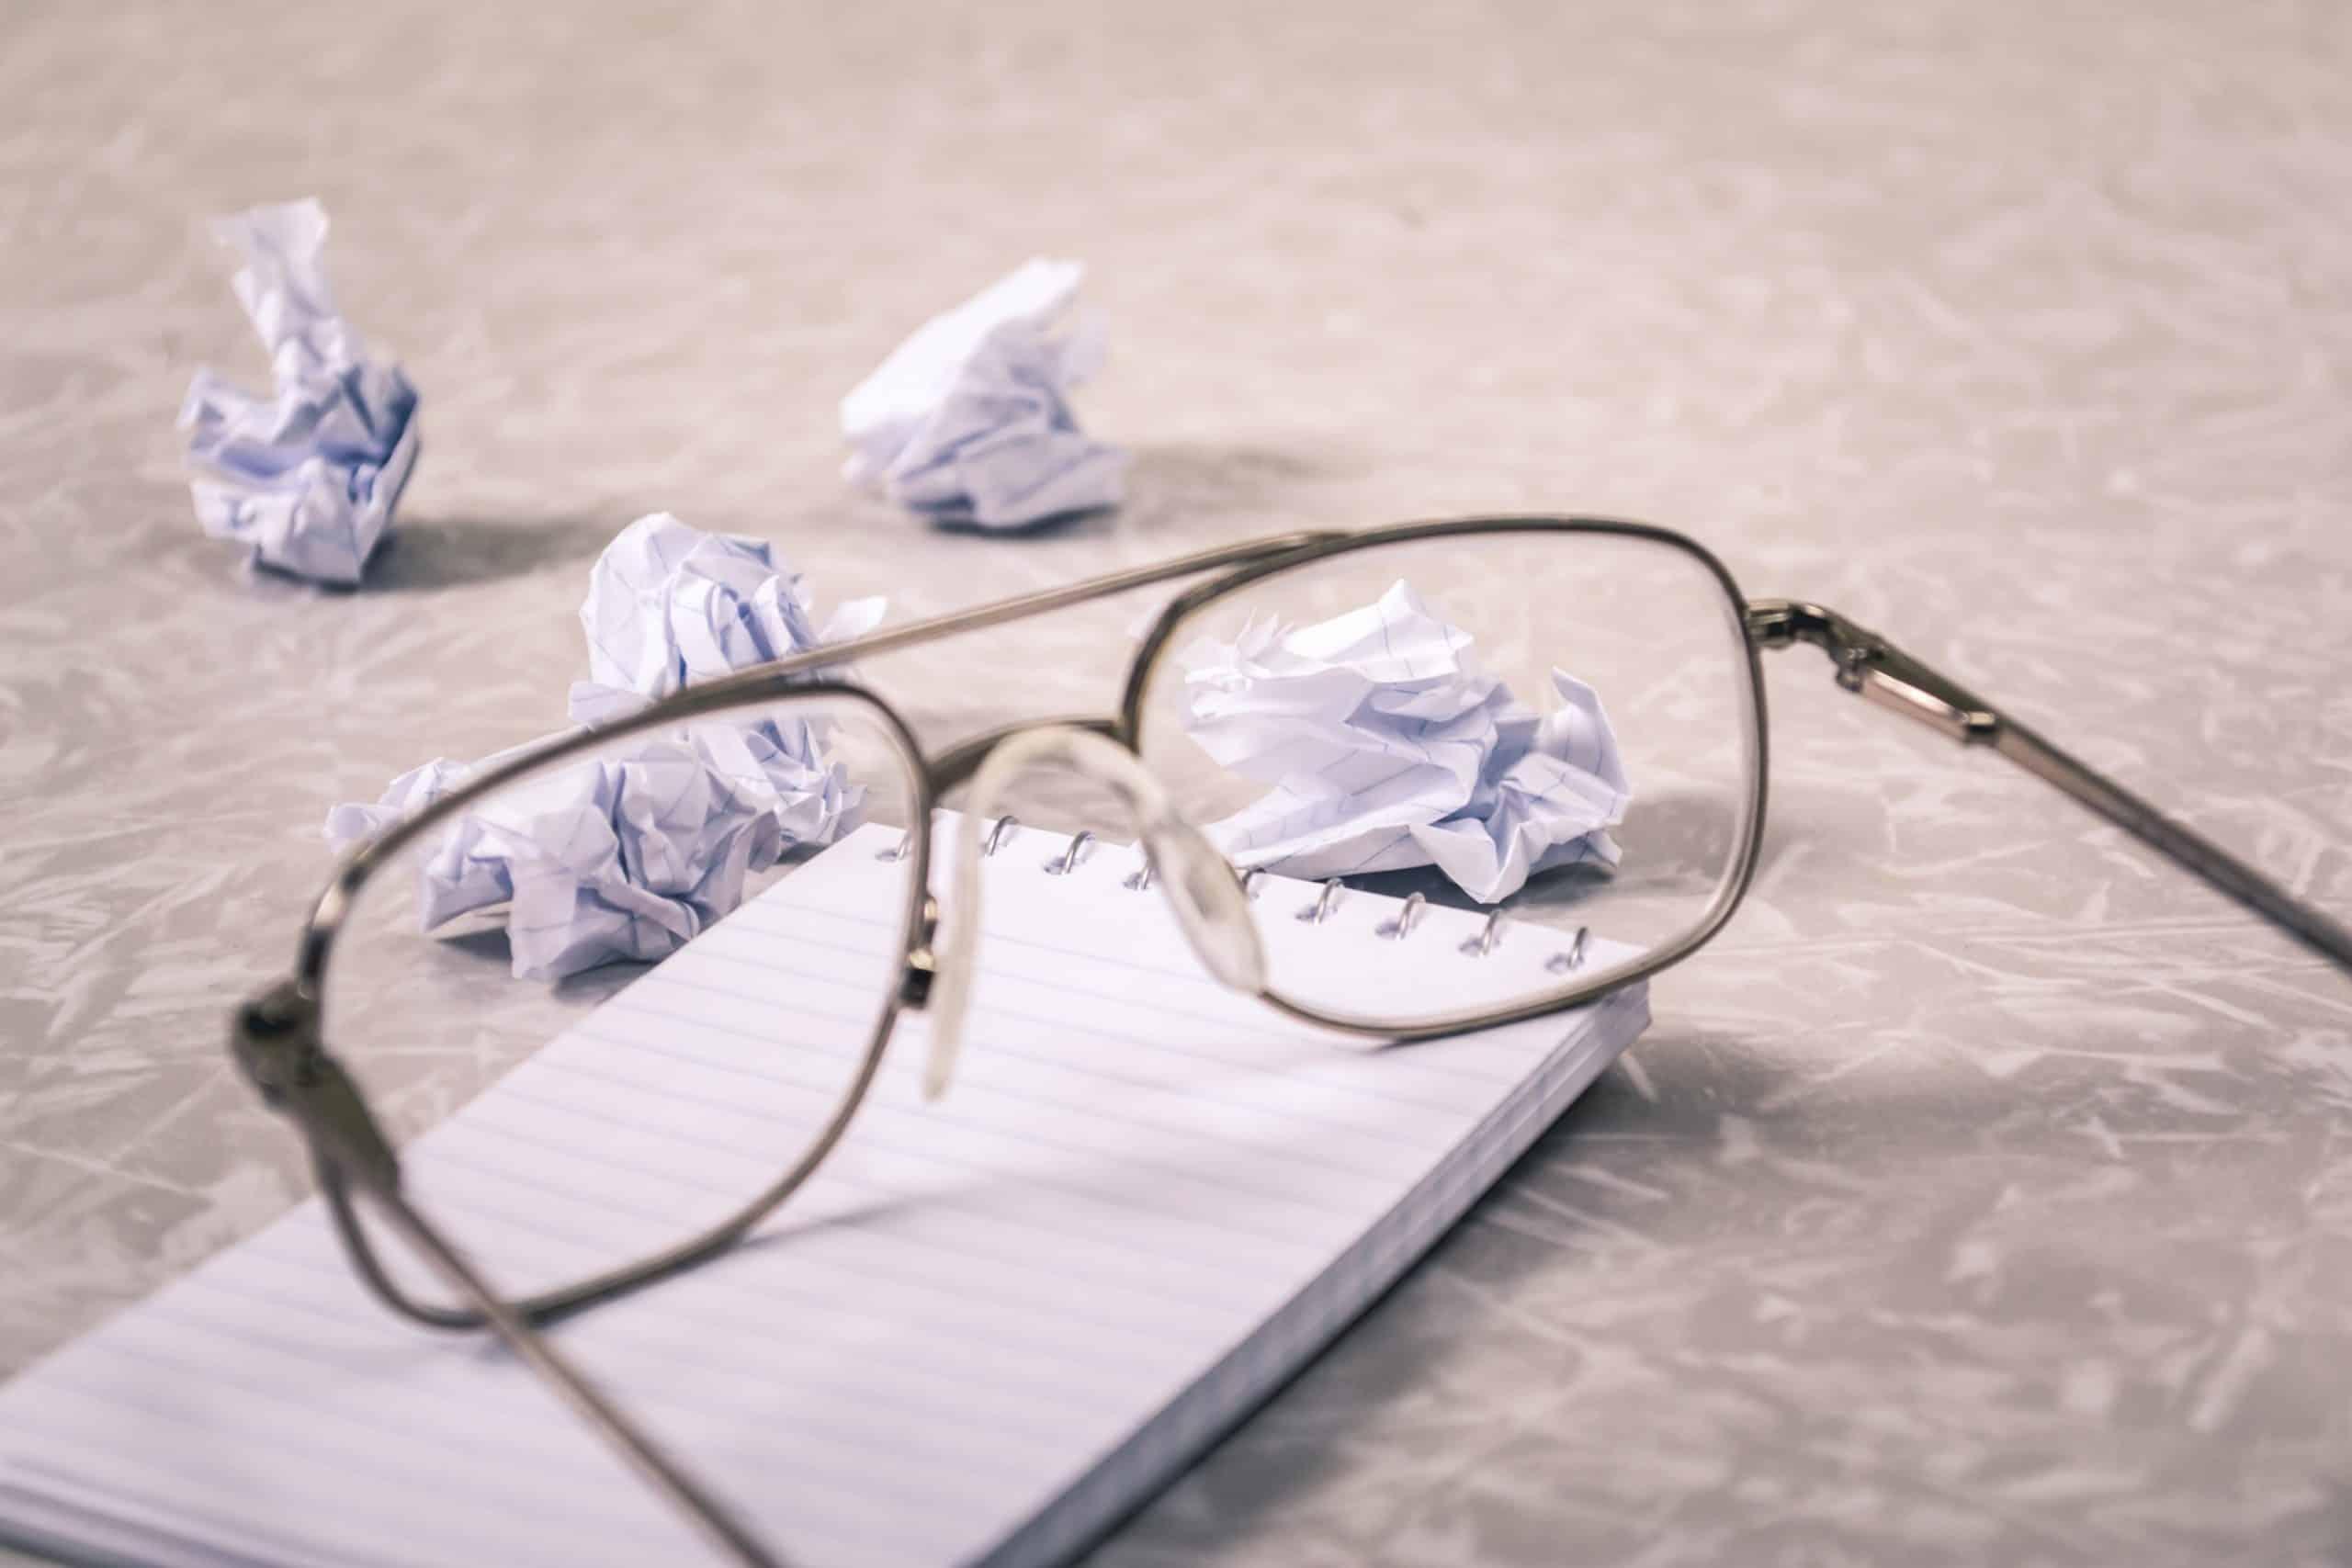 How To Overcome Creative Blocks When Feeling Stuck